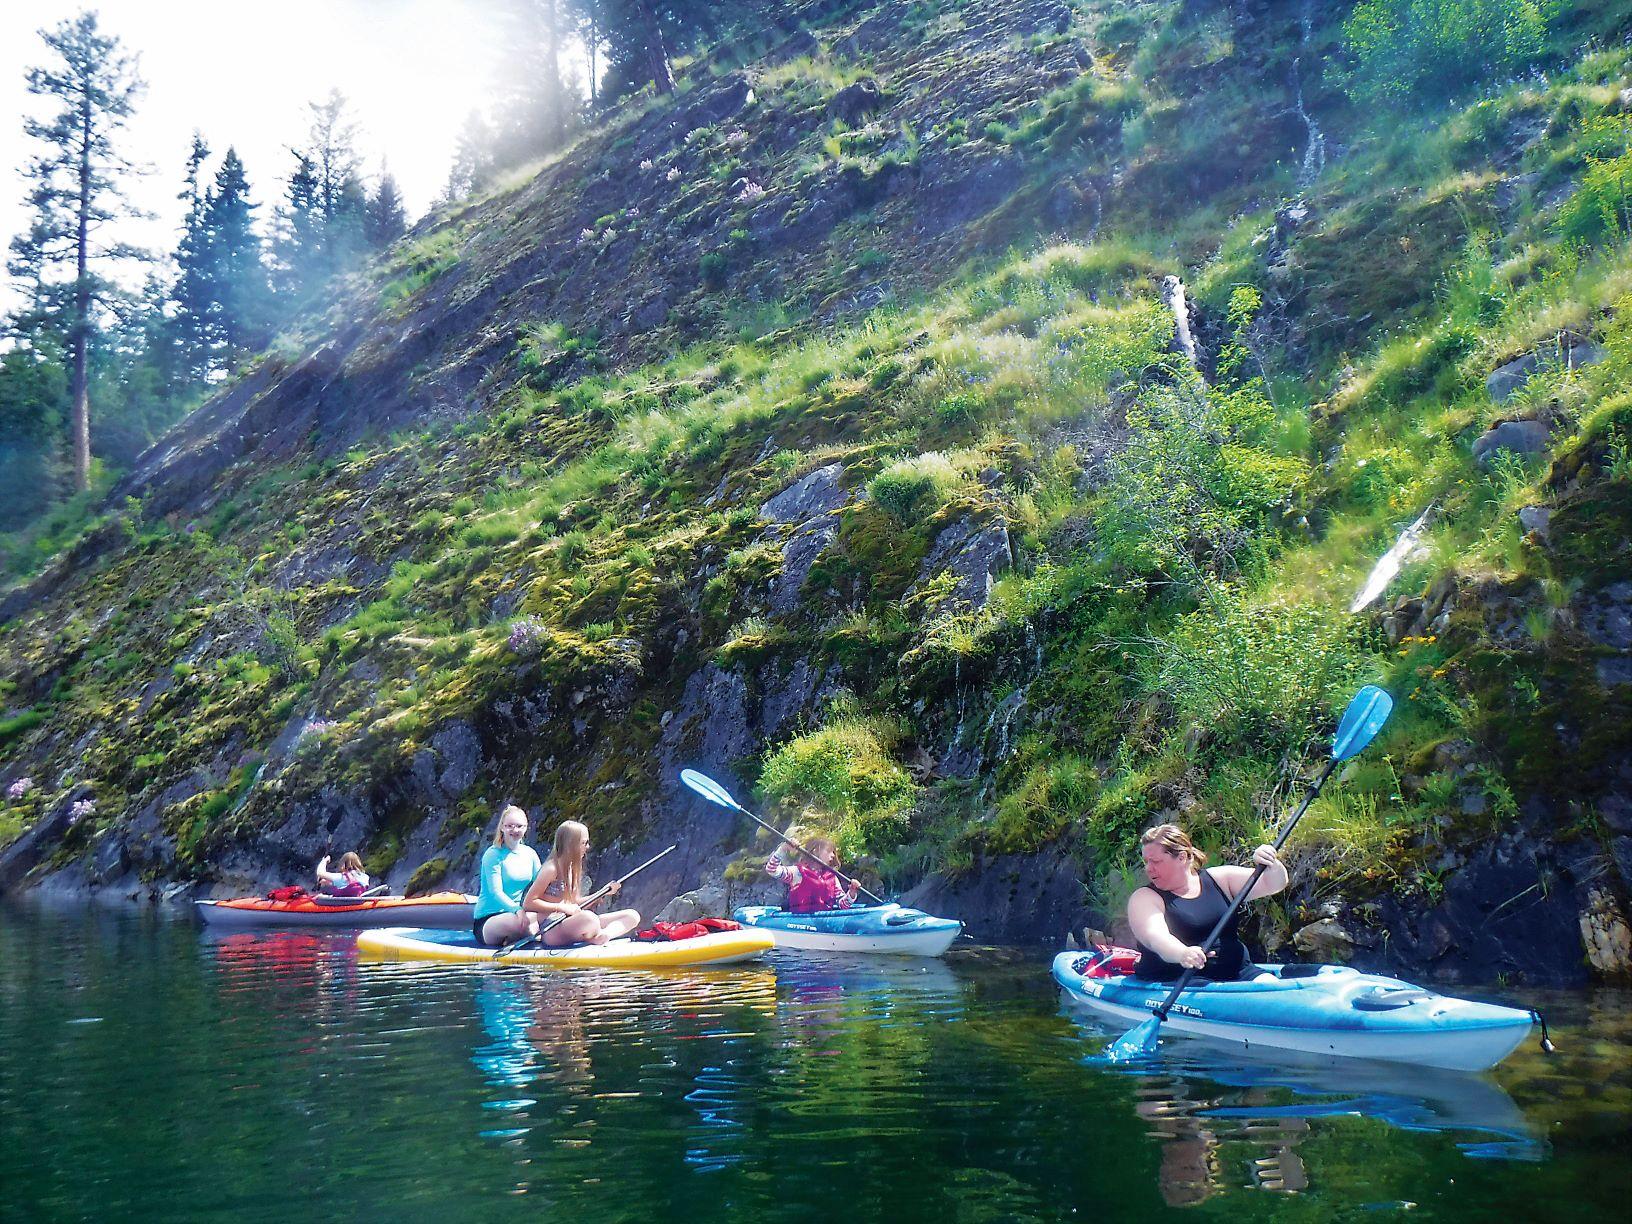 Mom and children kayaking near a rock cliff shoreline at Sullivan Lake.